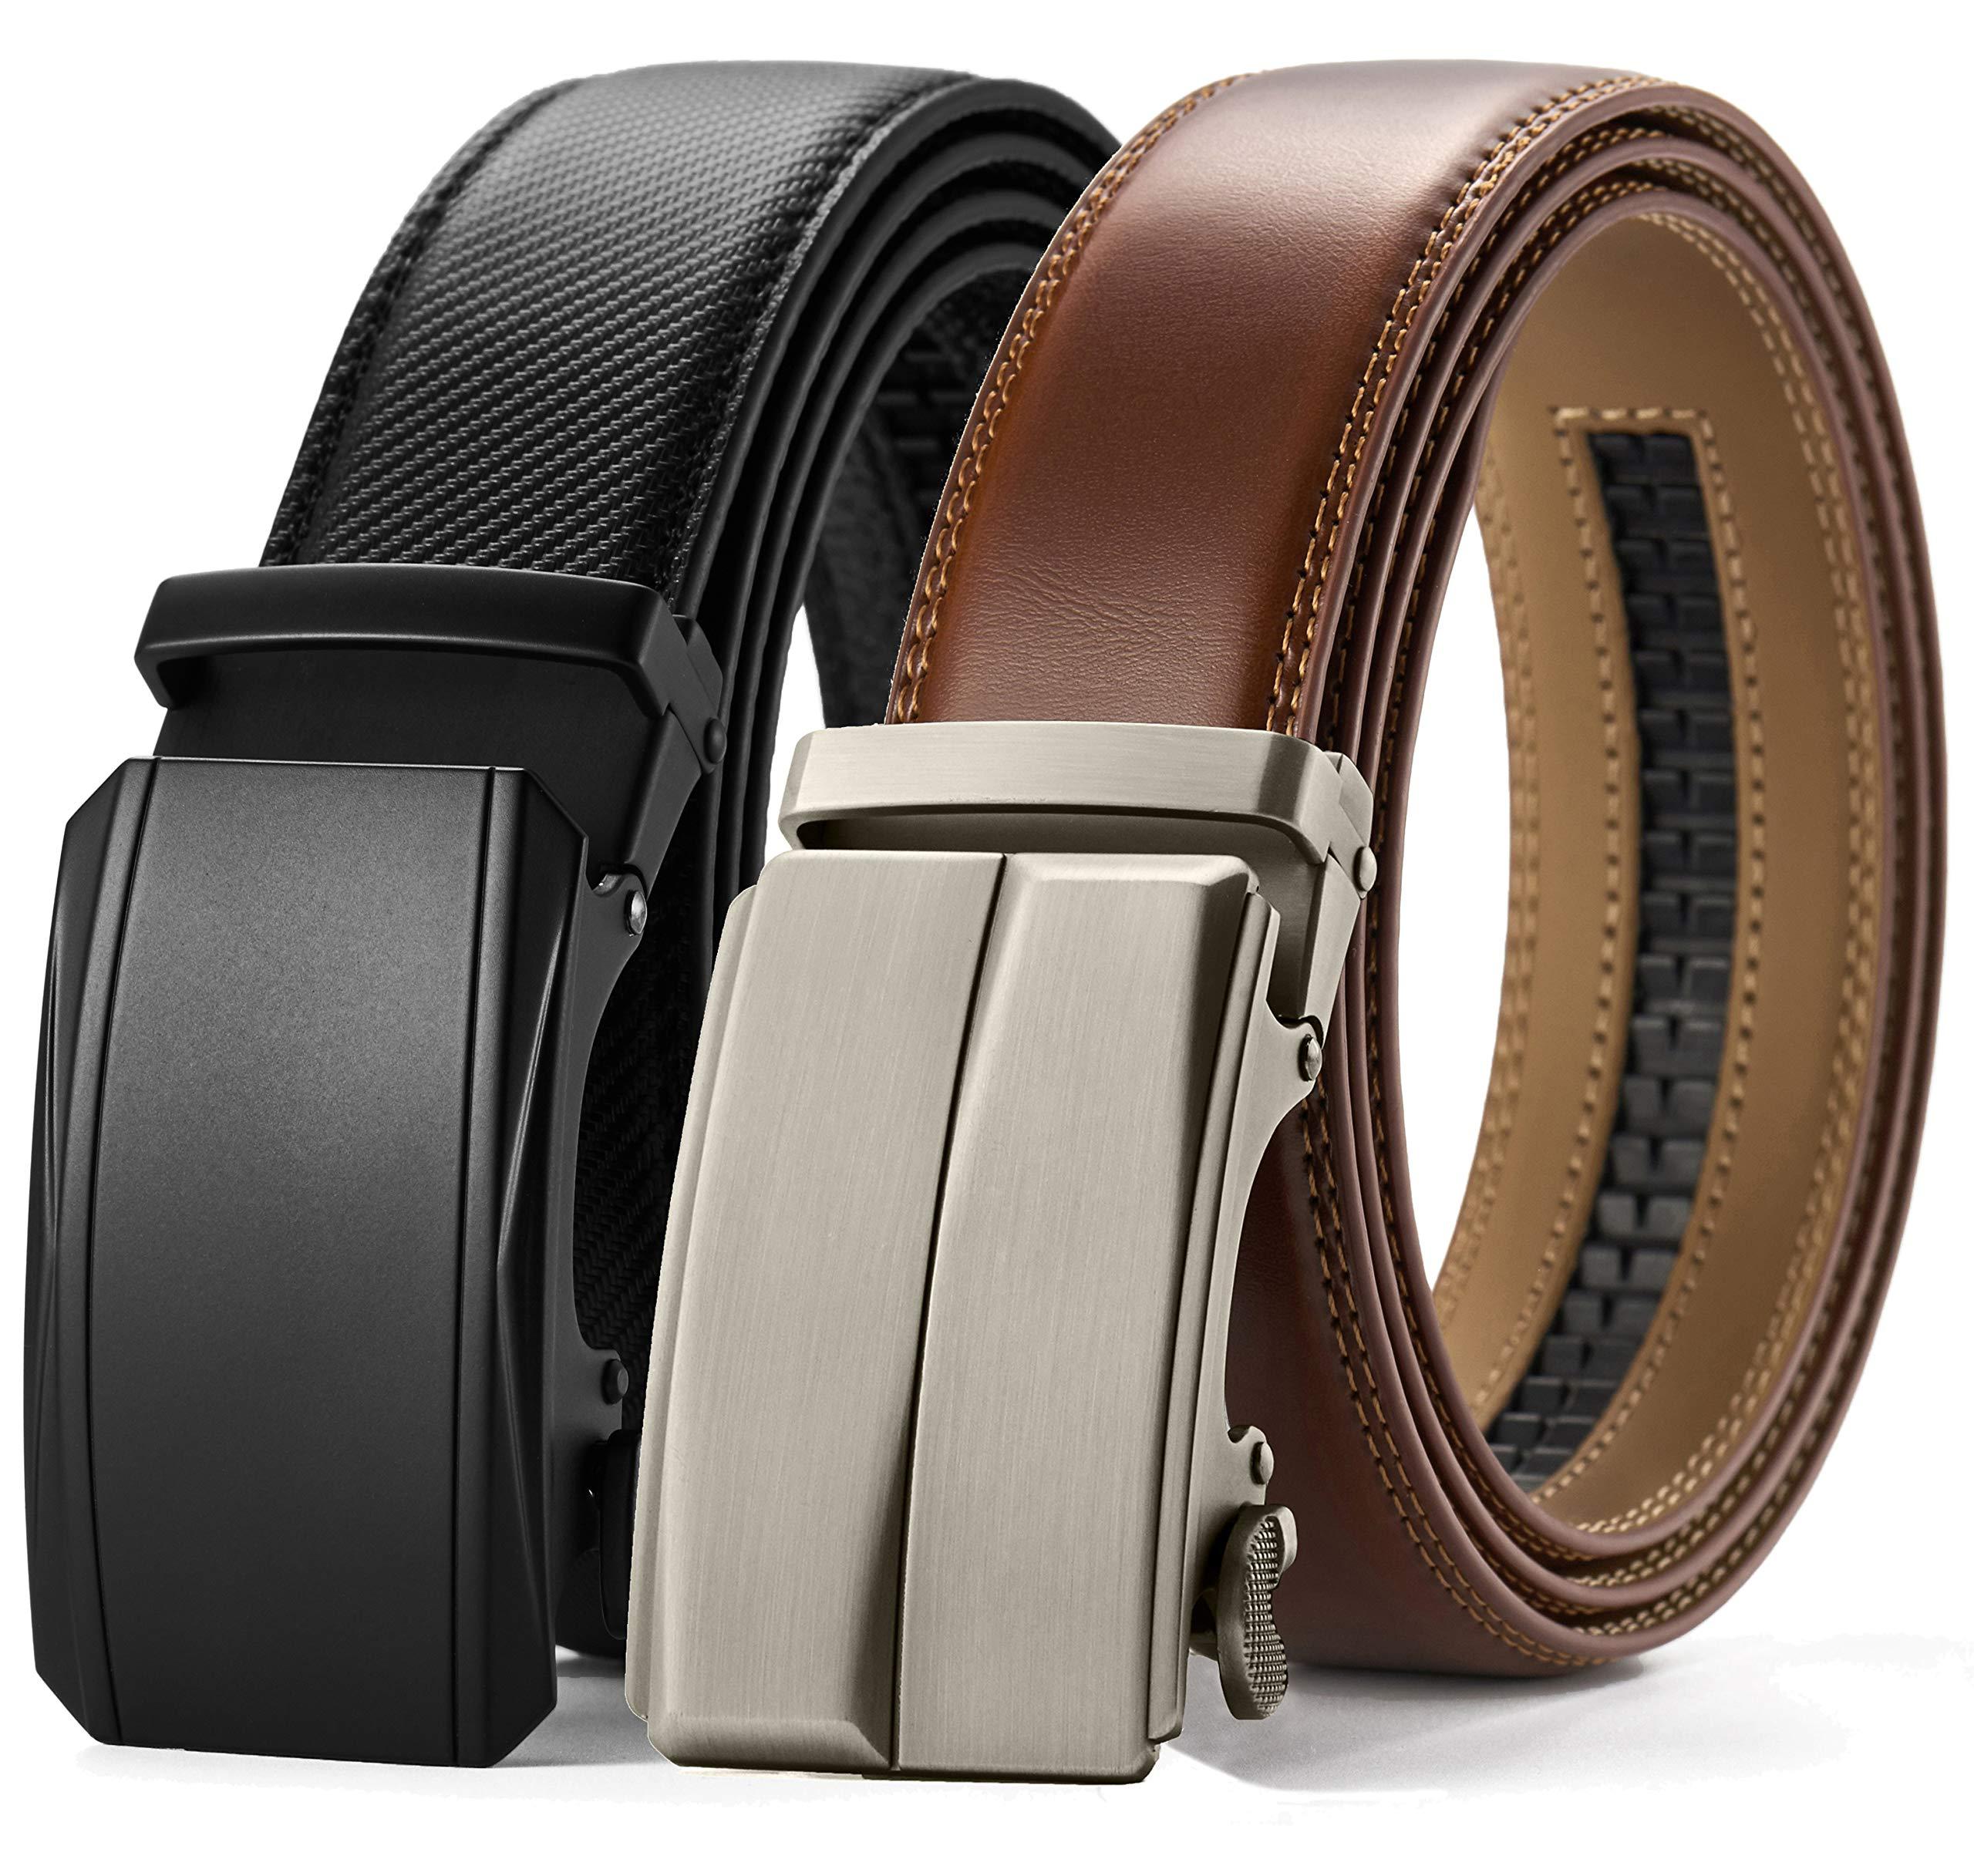 CHAOREN Leather Ratchet Belt Gift Set 1 3/8, Mens Belt Dress with Automatic  Buckle, Adjustable Trim to Fit- Buy Online in Pakistan at desertcart.pk.  ProductId : 127108214.